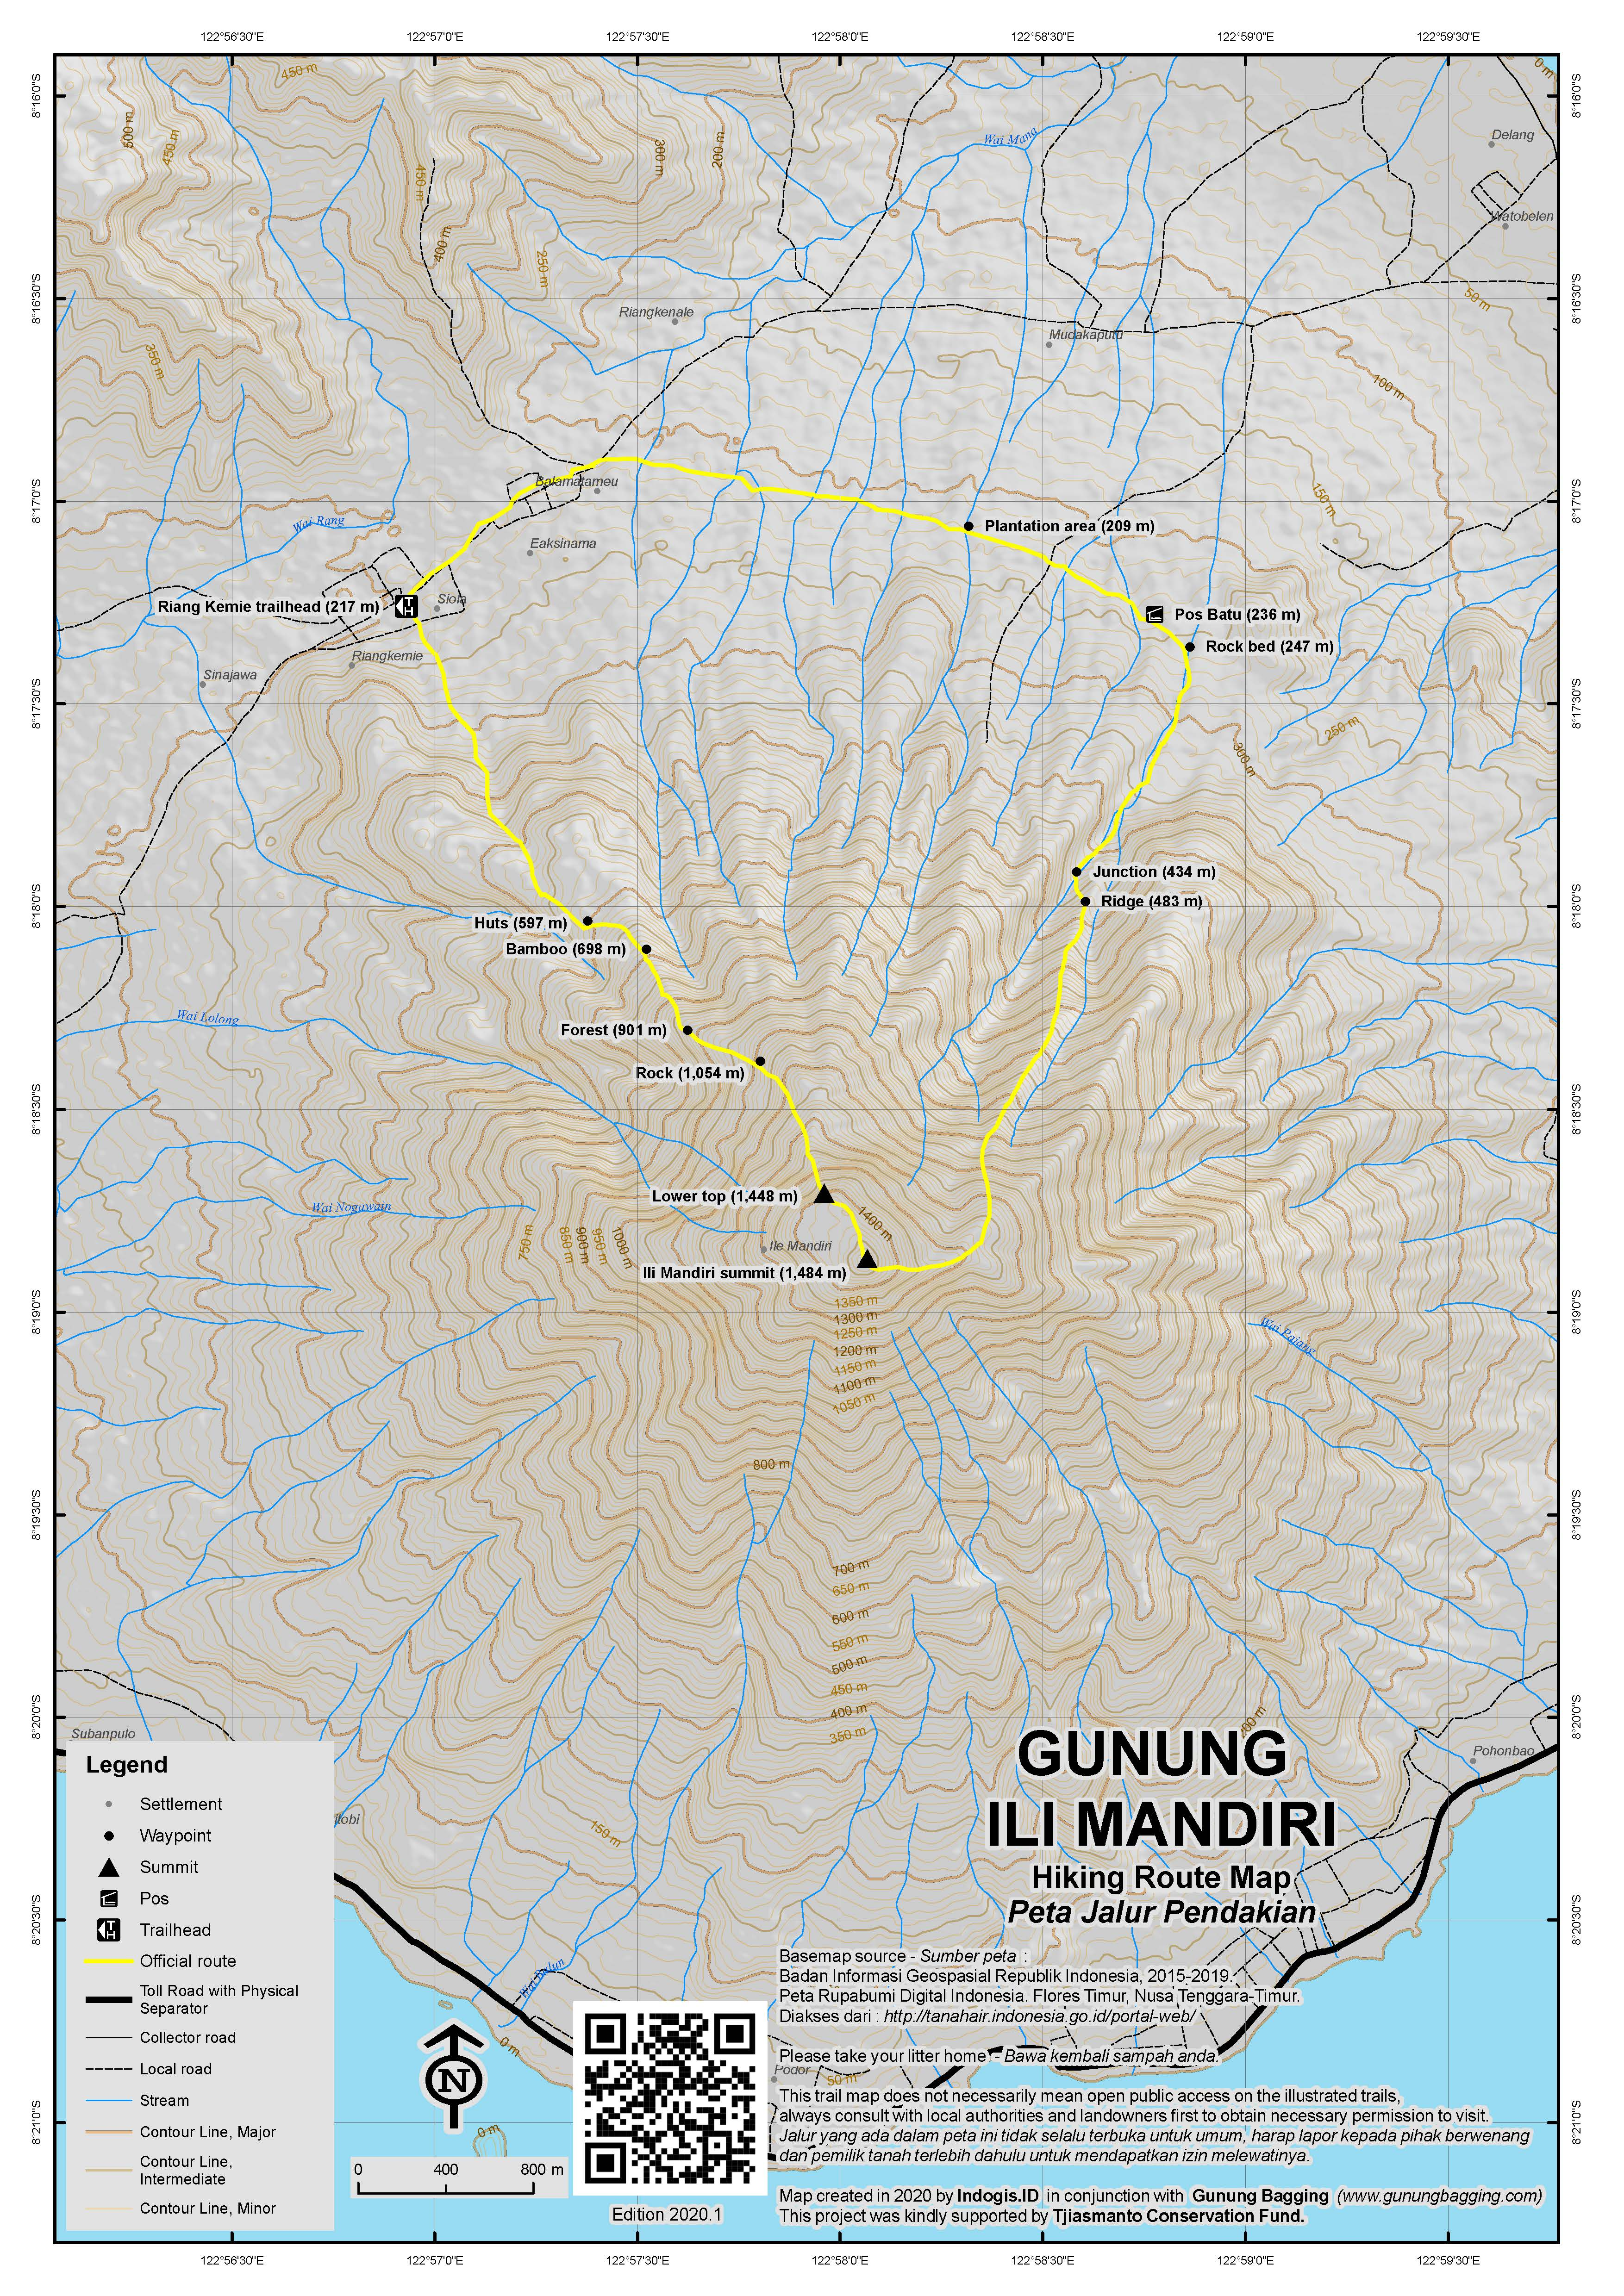 Peta Jalur Pendakian Ili Mandiri